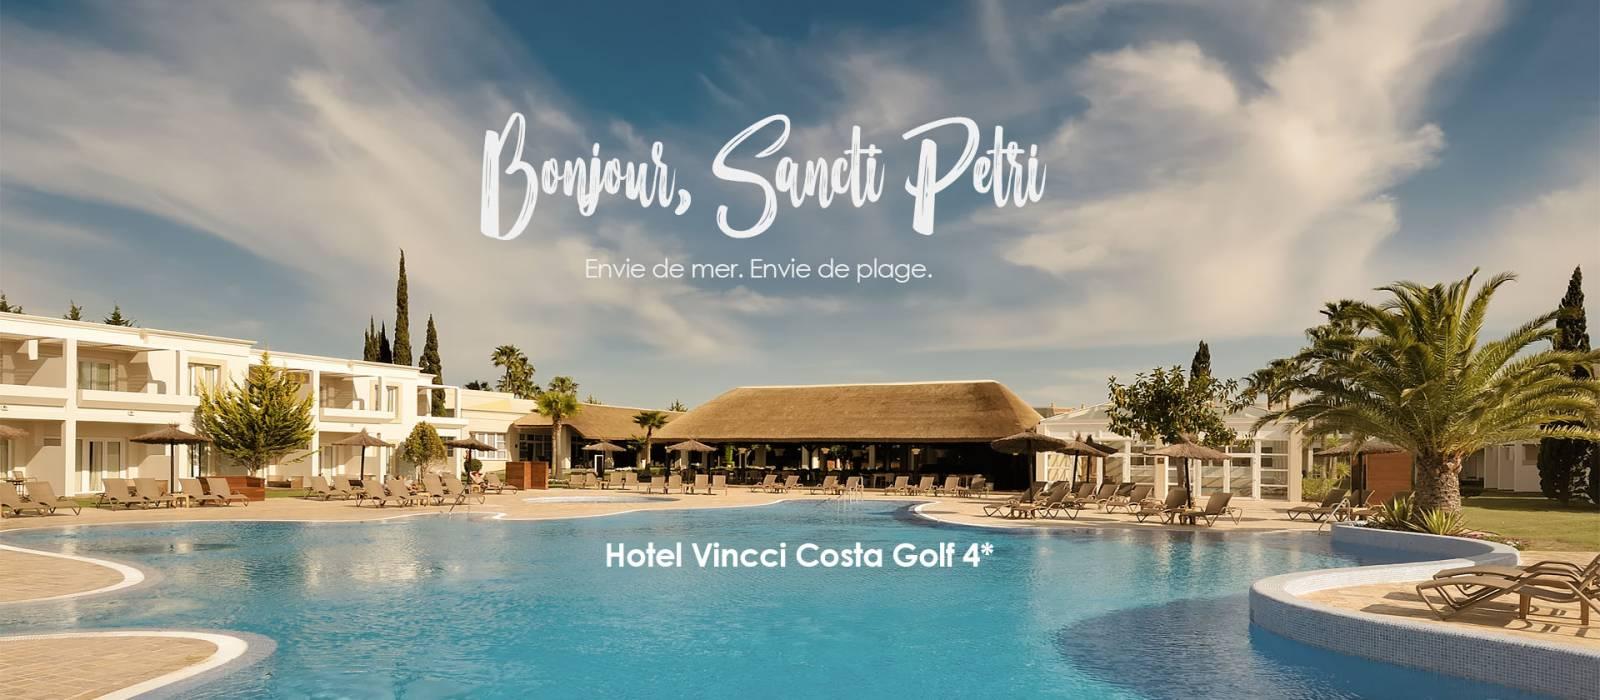 Apertura Costa Golf 19 FR